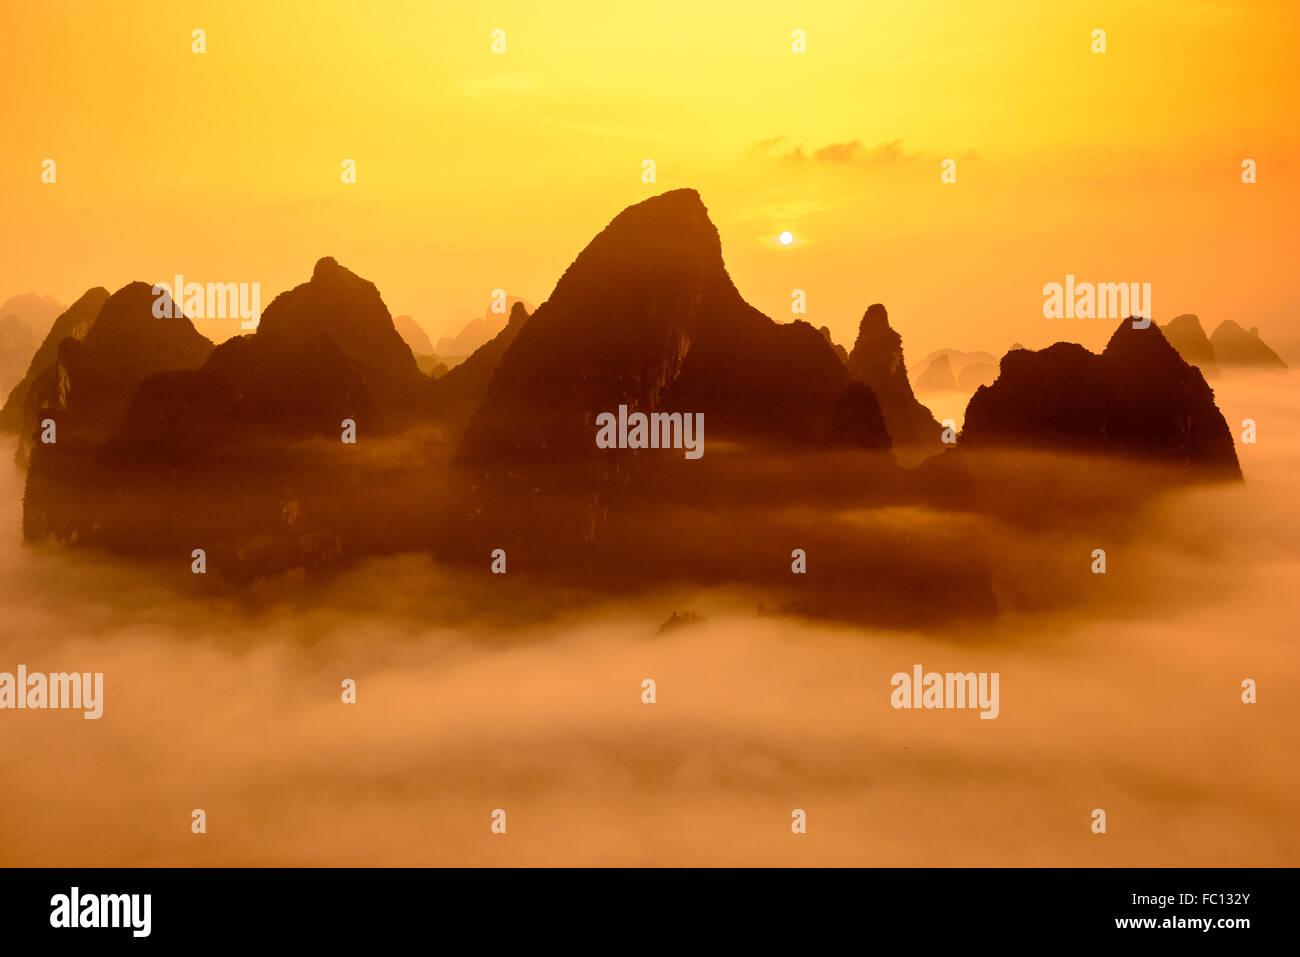 Guilin, China Karst mountains. - Stock Image